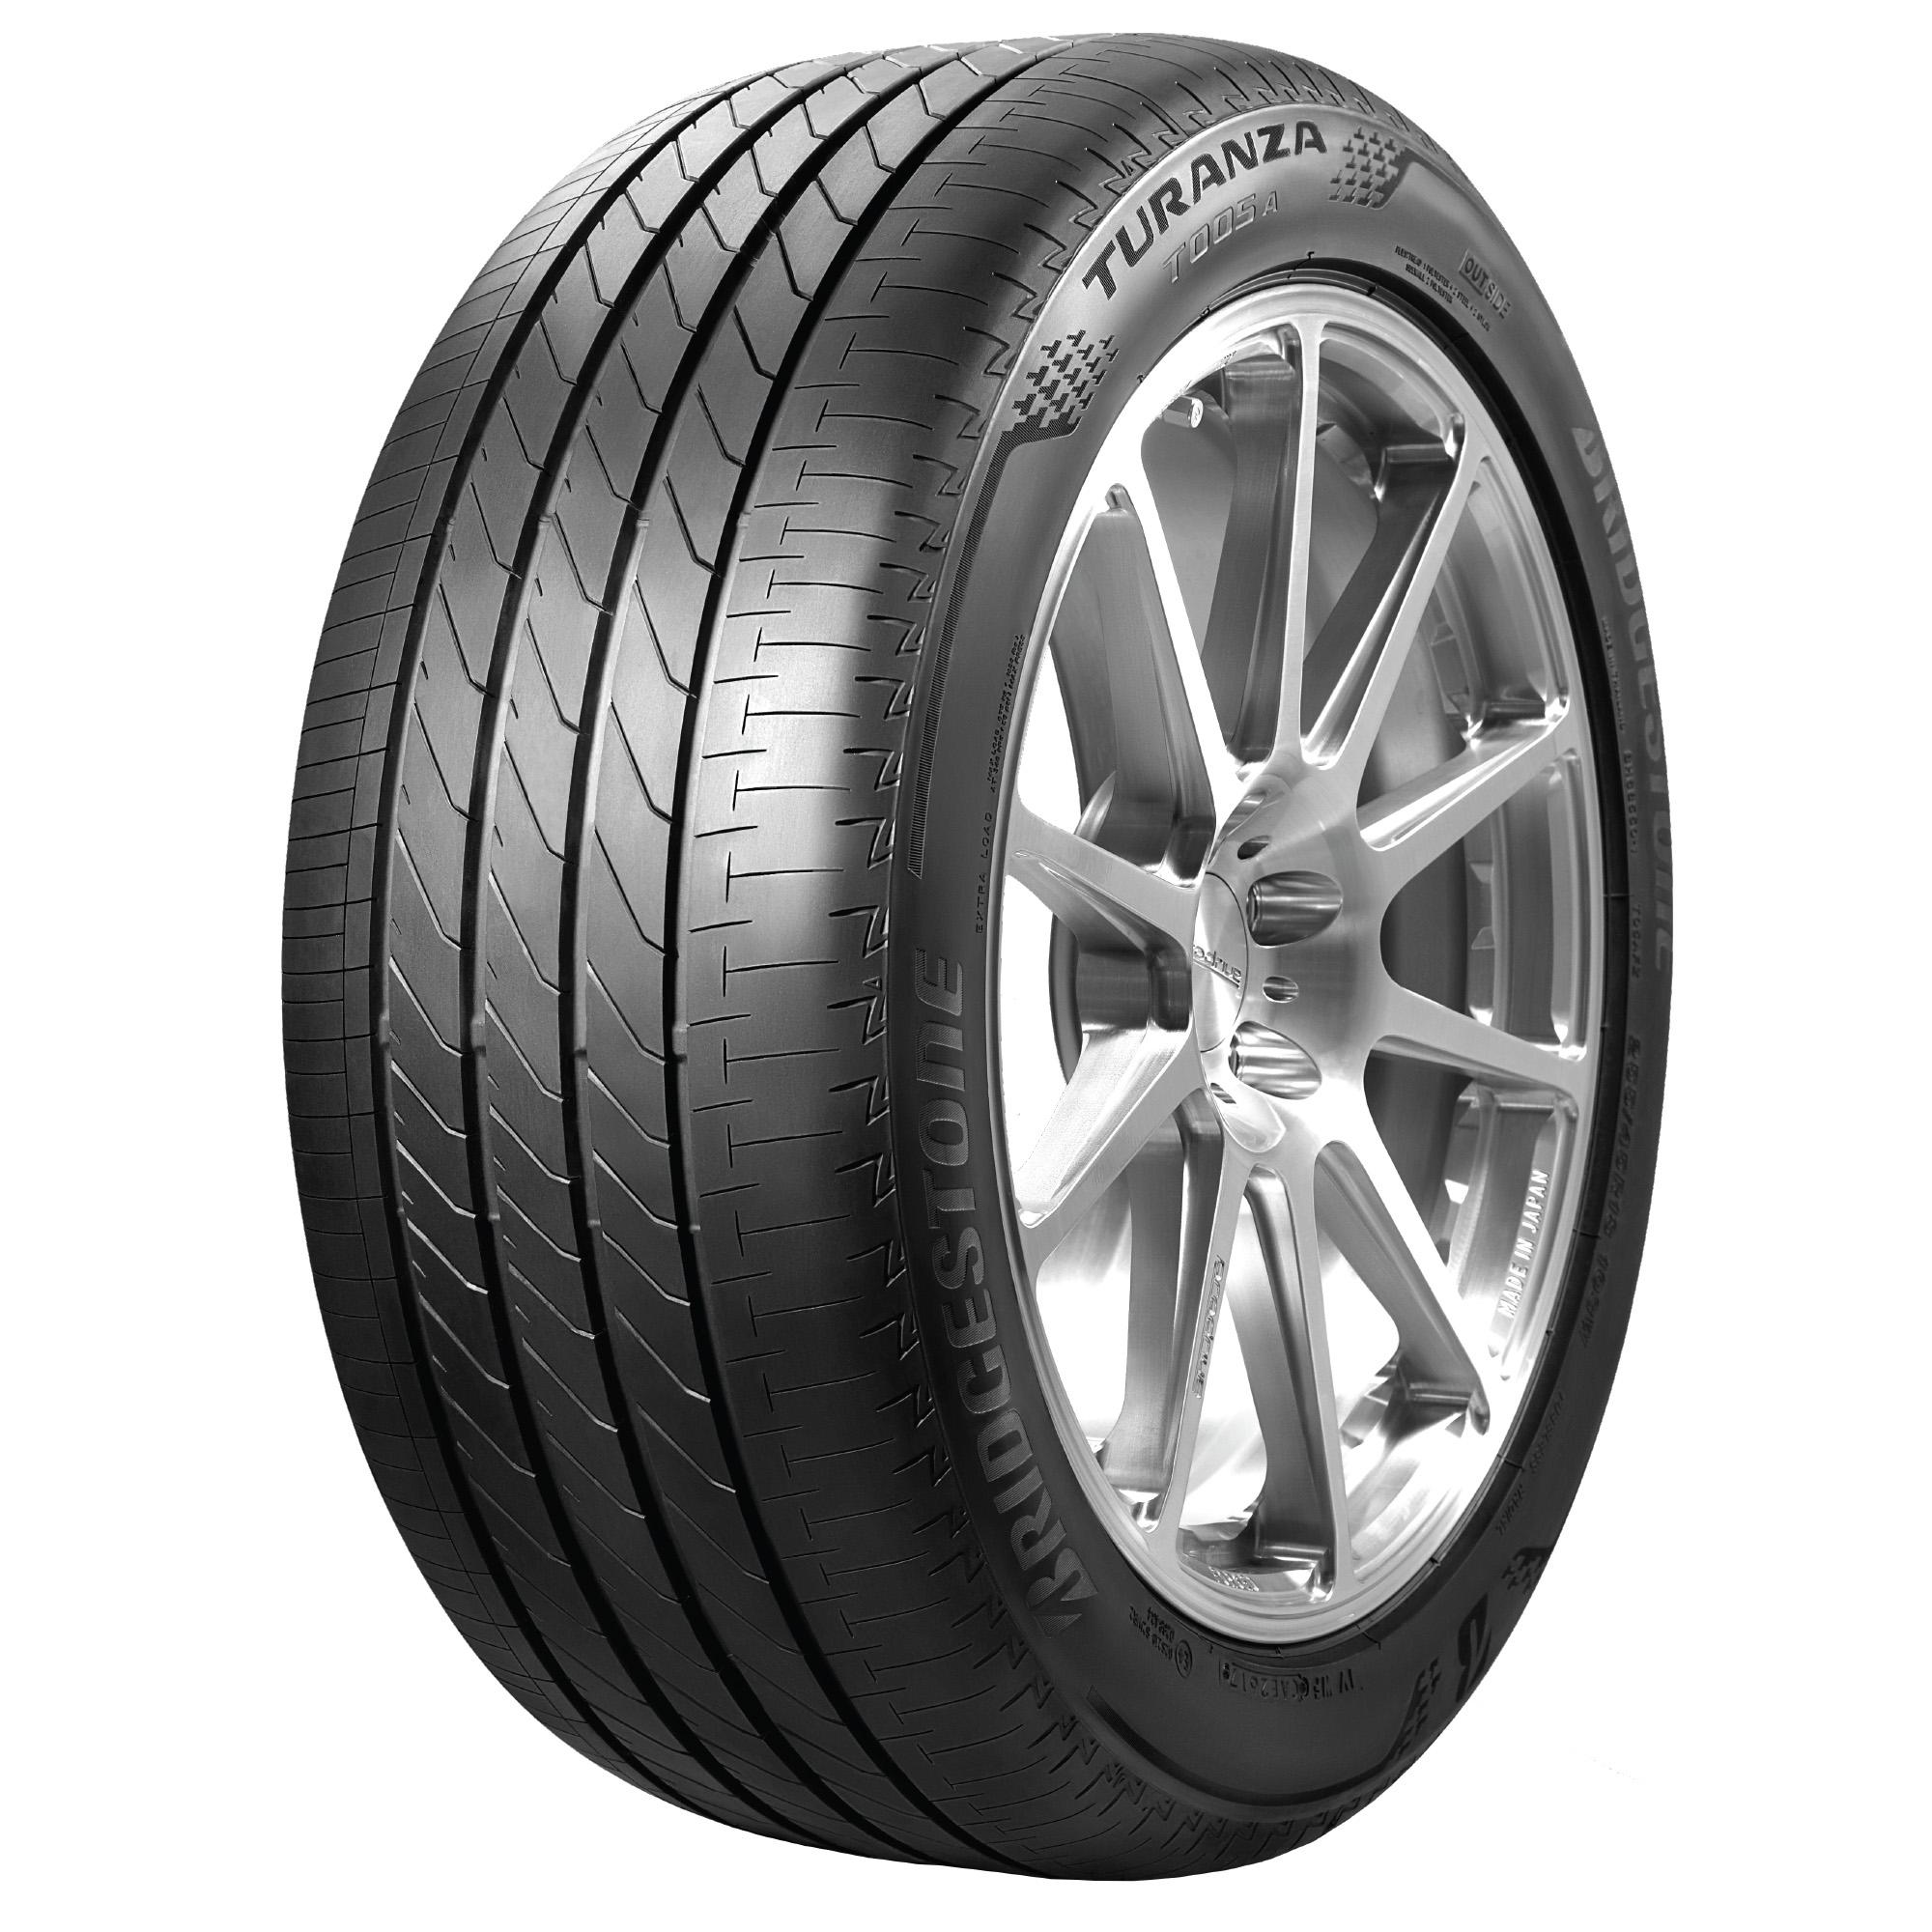 Bridgestone Turanza Tyre | Comfort & Quiet | Bridgestone